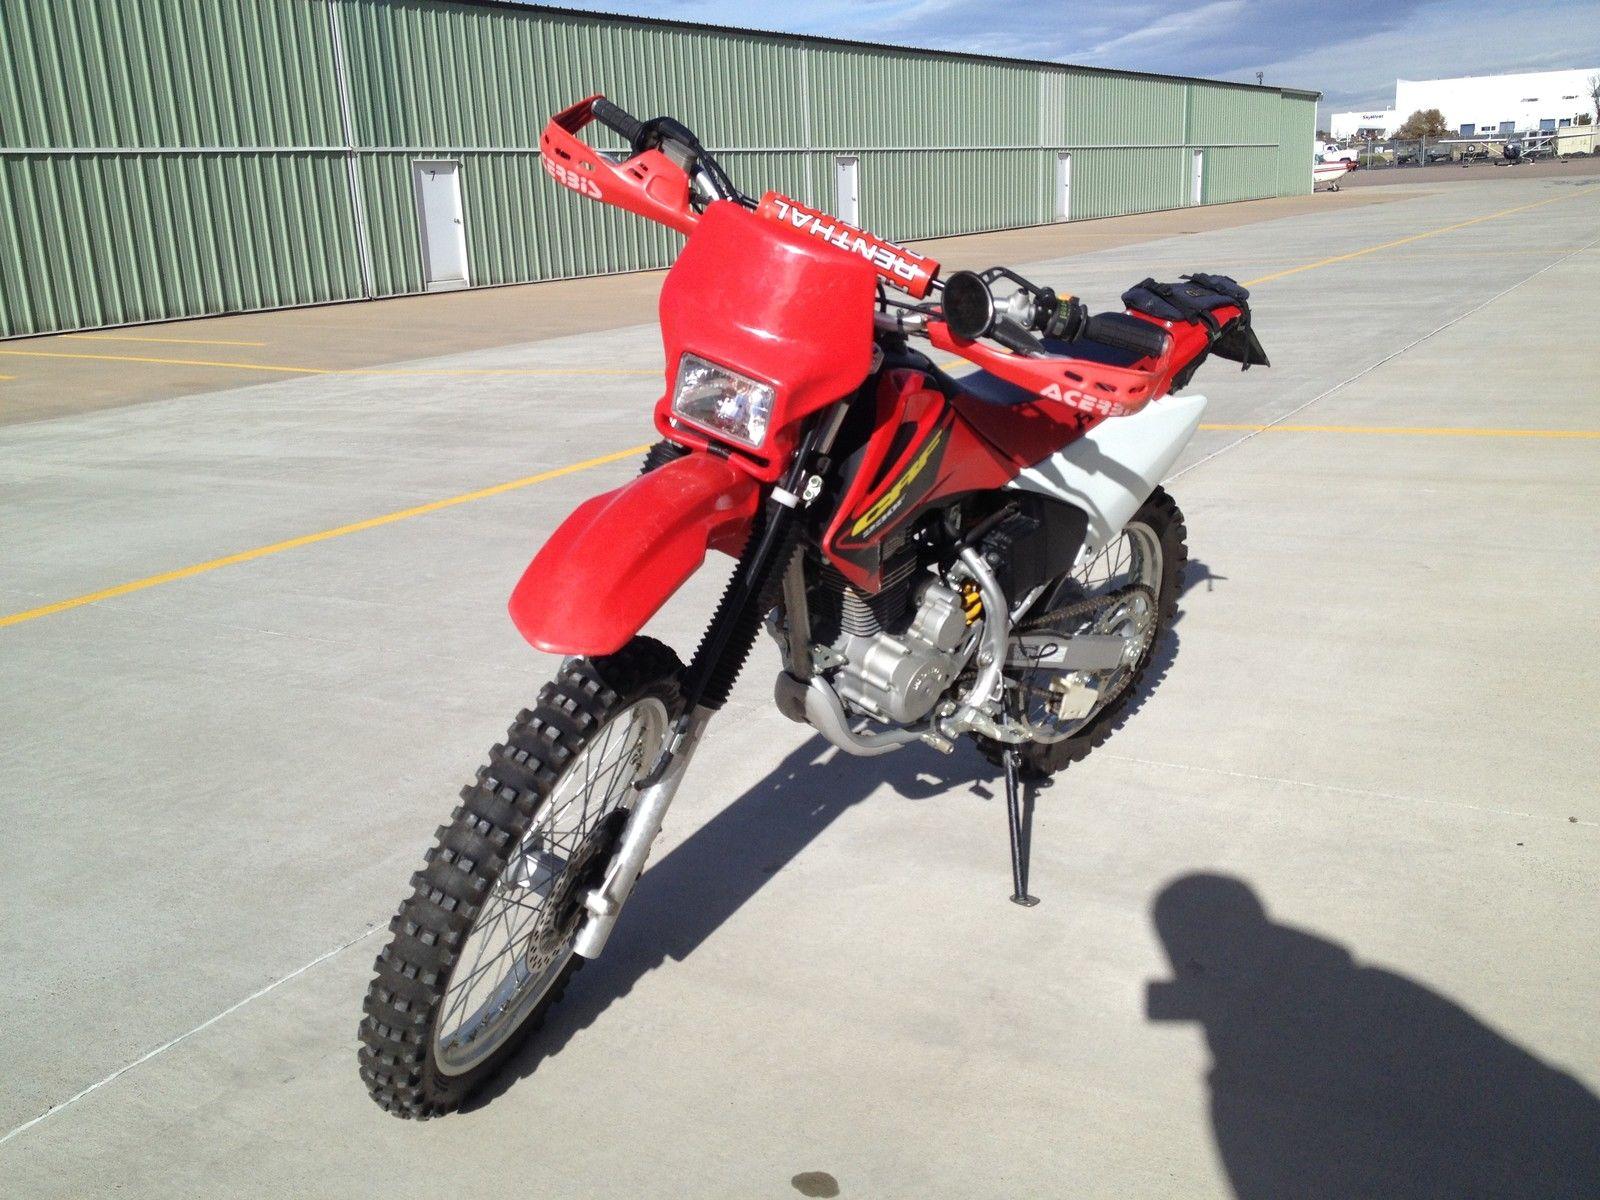 Honda Crf230f Dirt Bike Electric Start Amp Lights 250 400